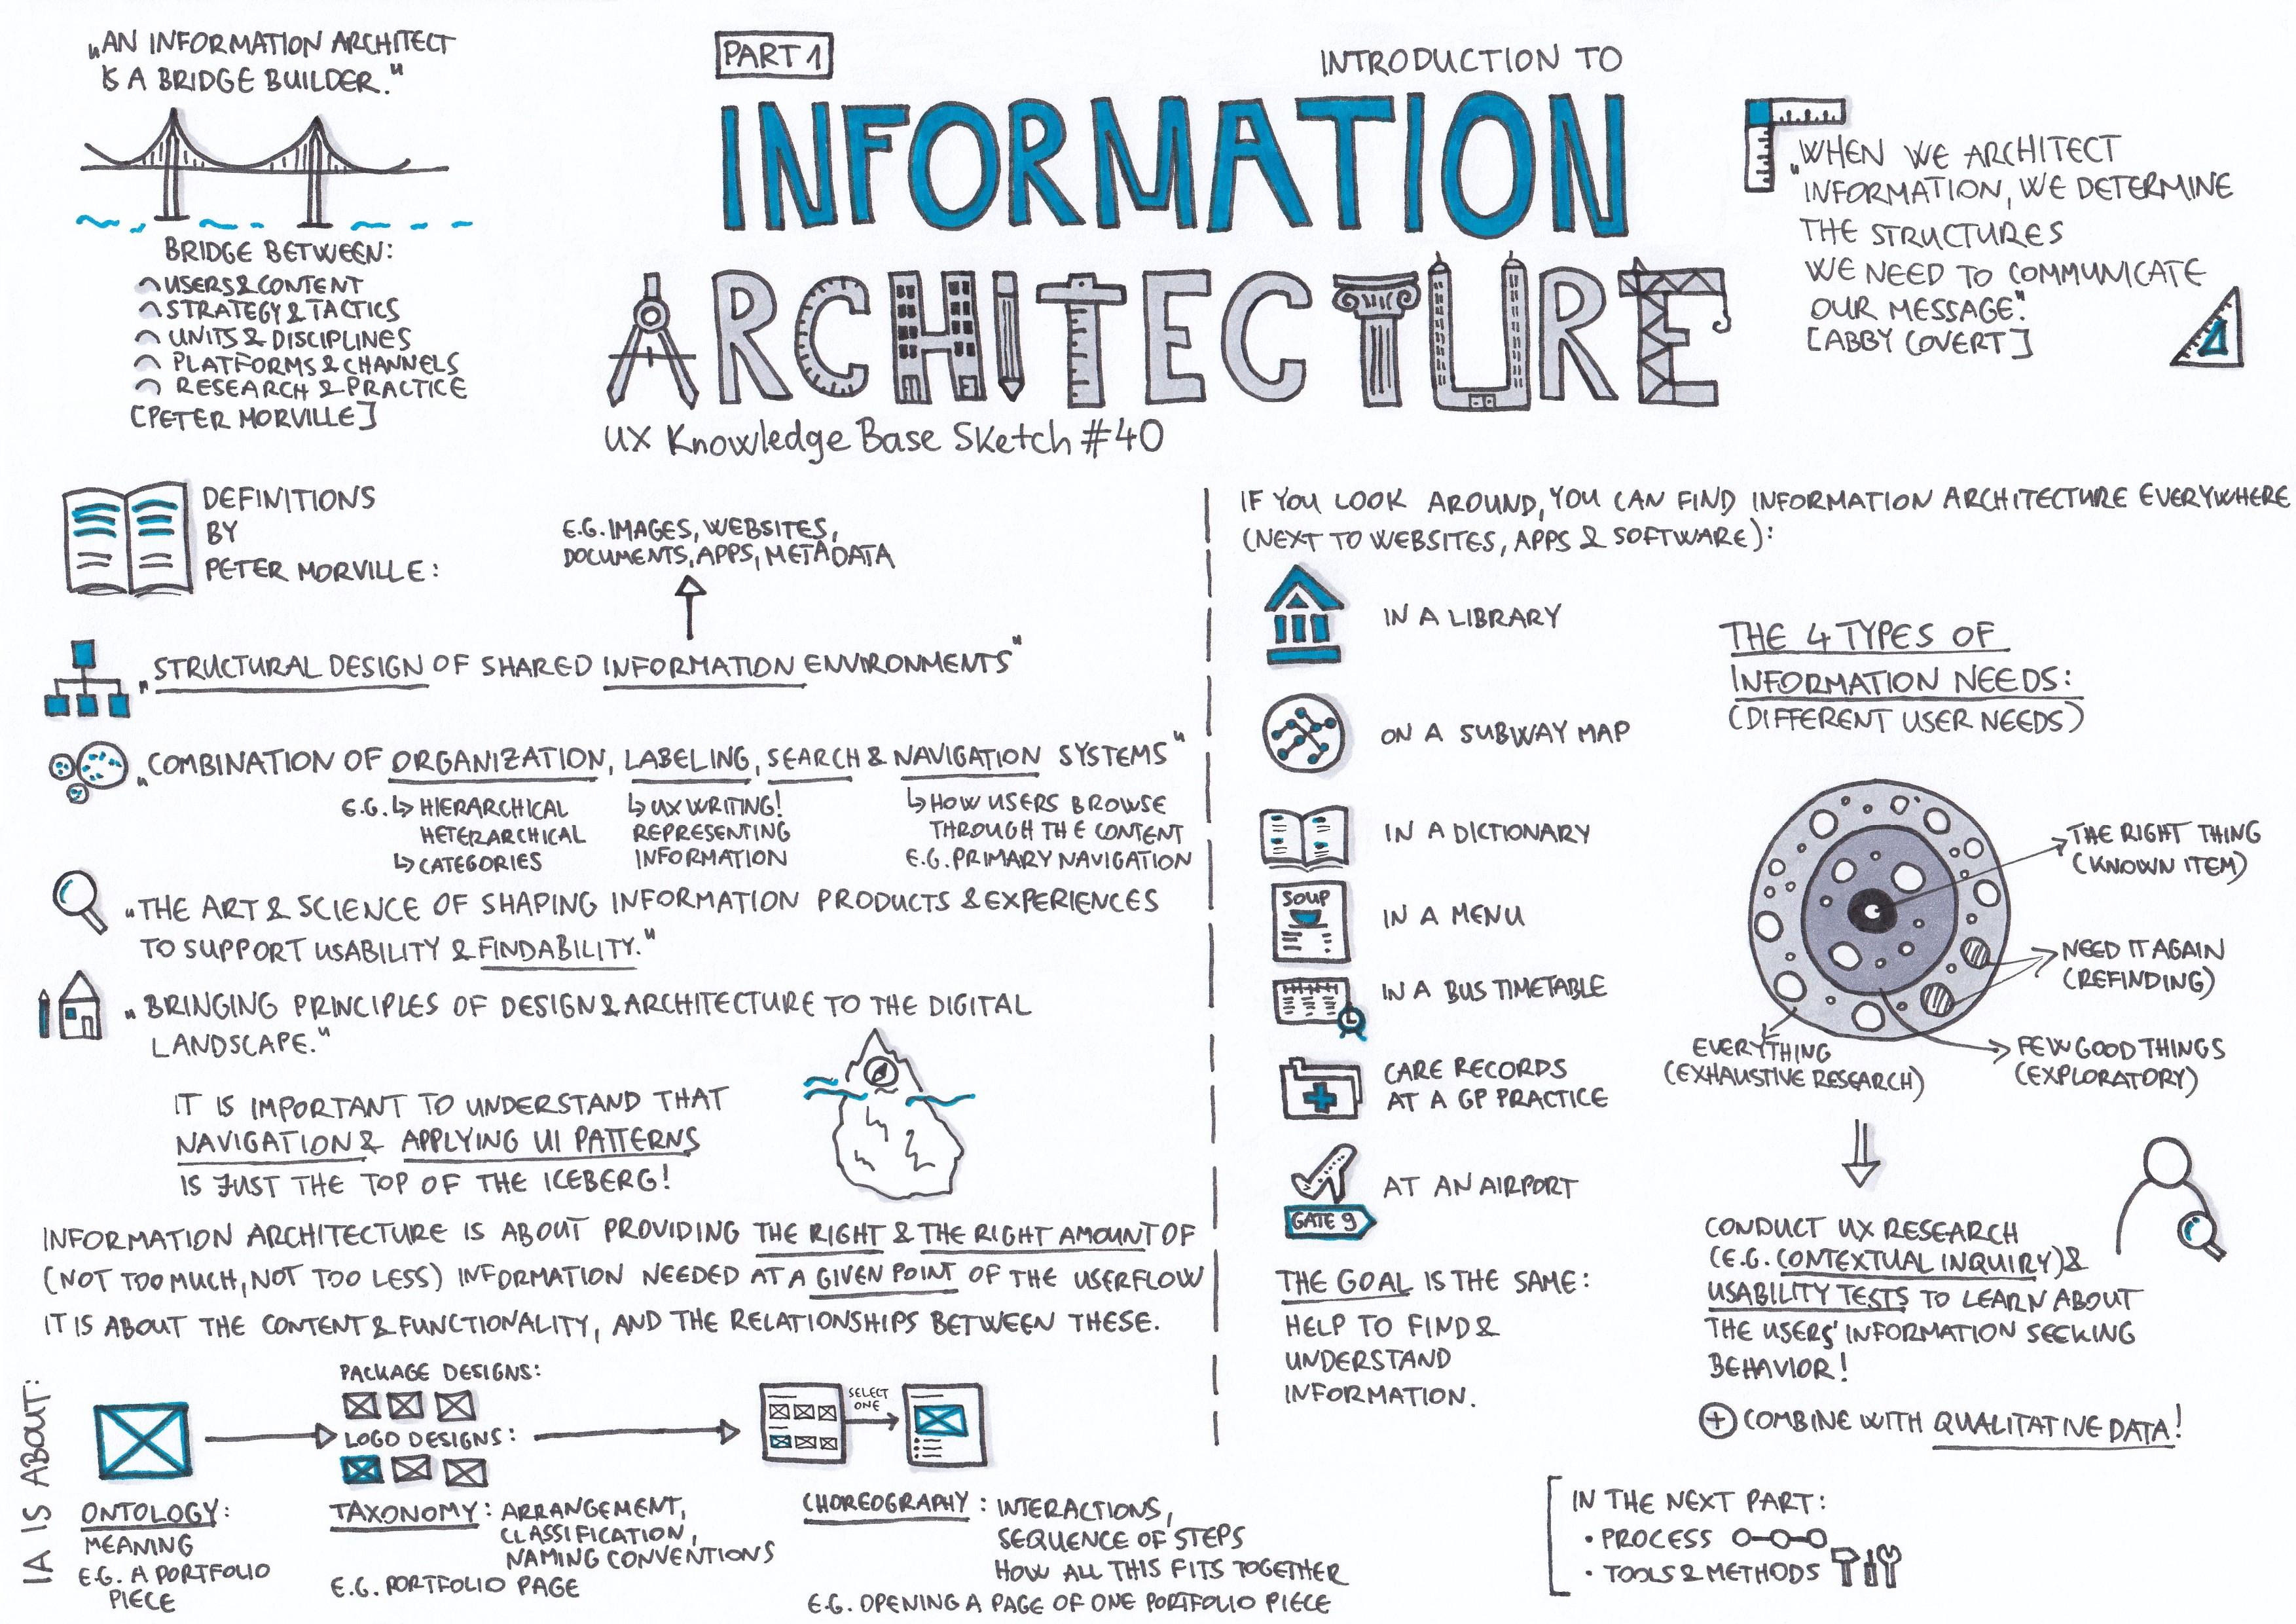 Information Architecture Part 1 — UX Knowledge Base Sketch #40